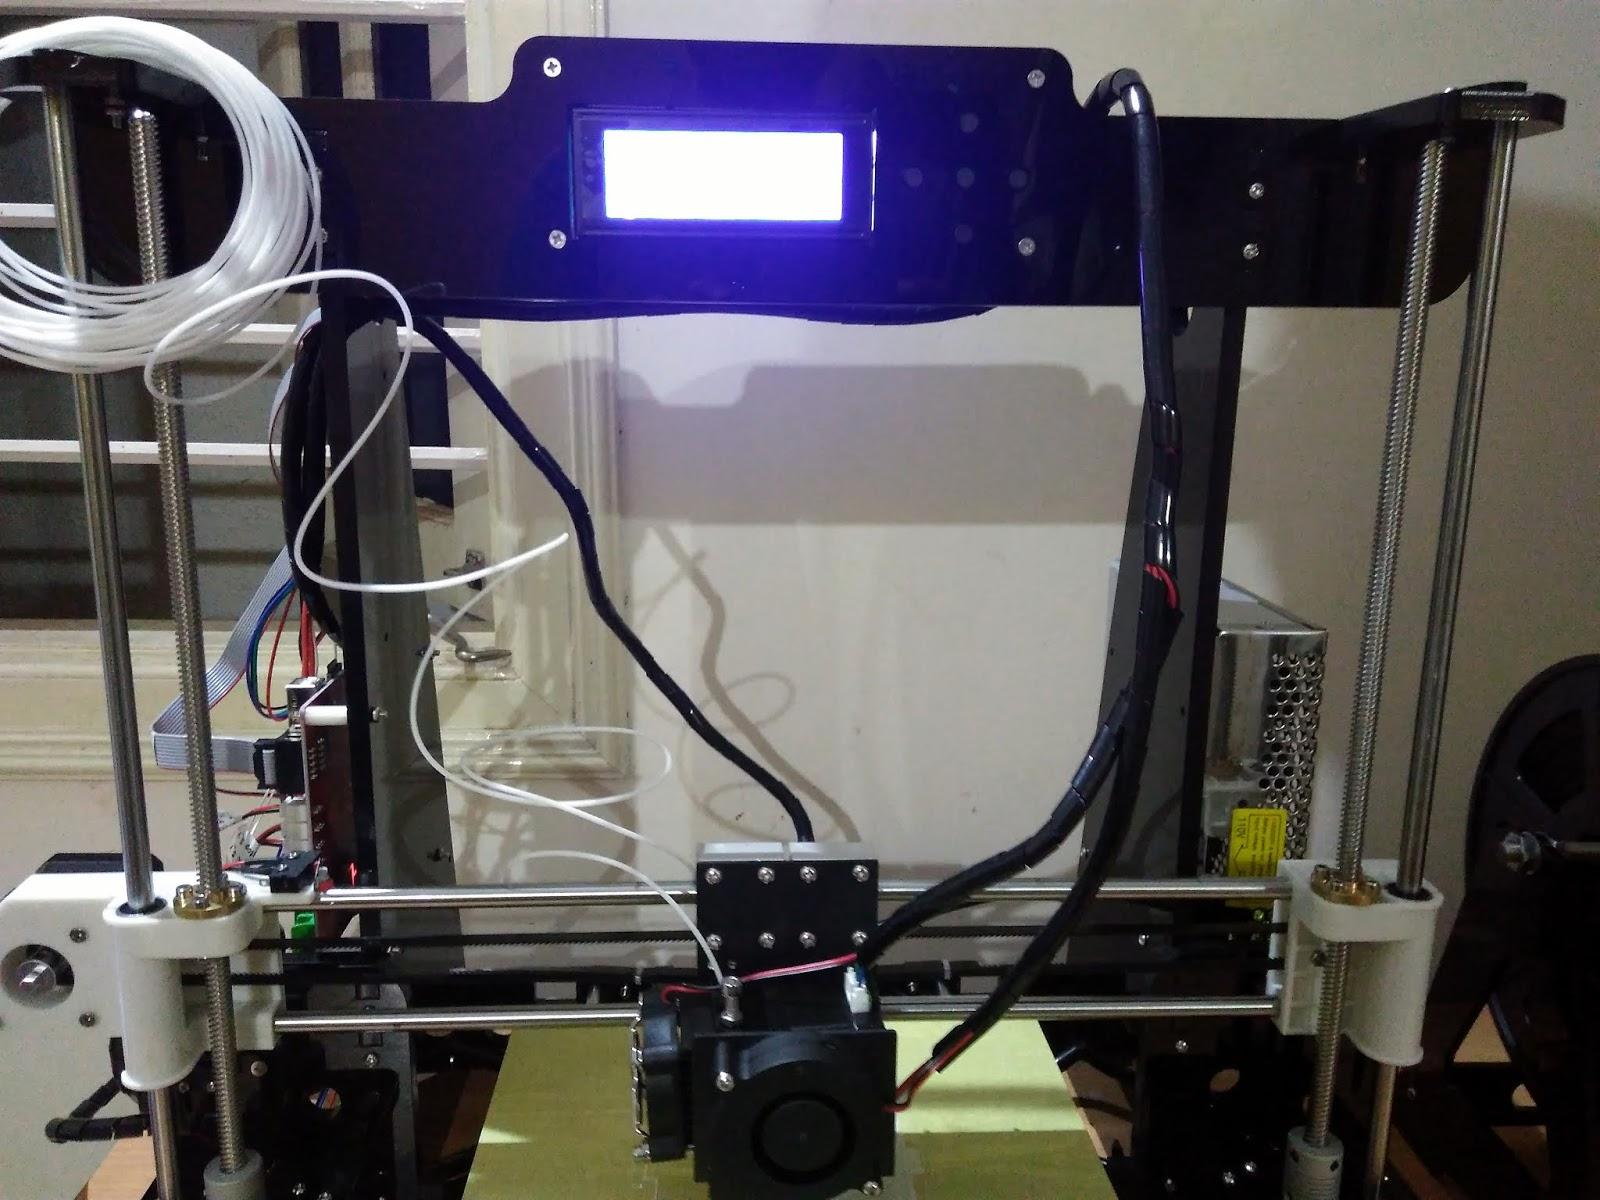 How to upgrade Anet A8/A6 3D Printer Firmware Marlin using Arduino